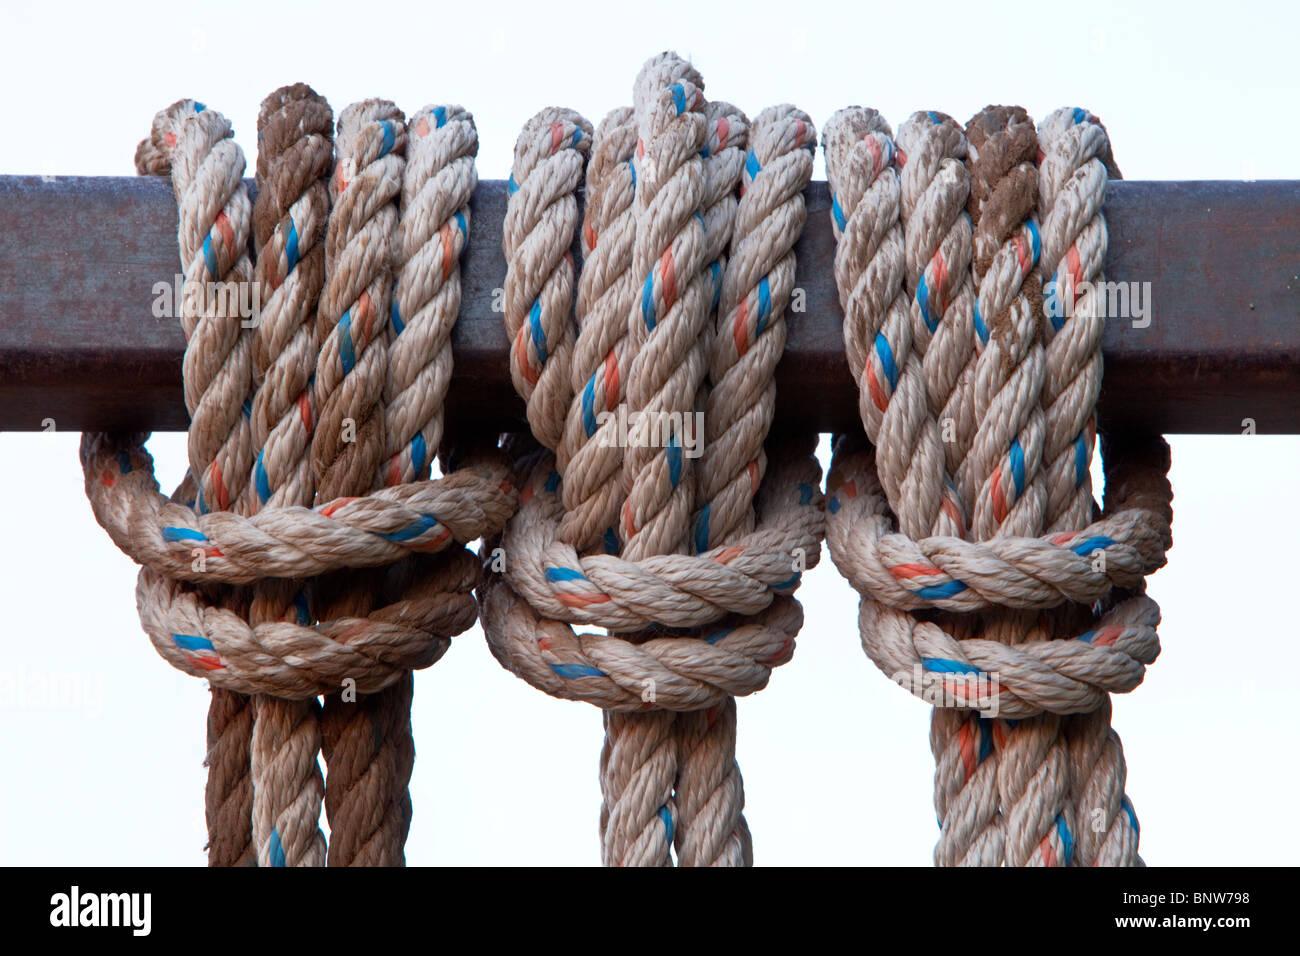 Reverse Lark's Head knots over metal bar - Stock Image